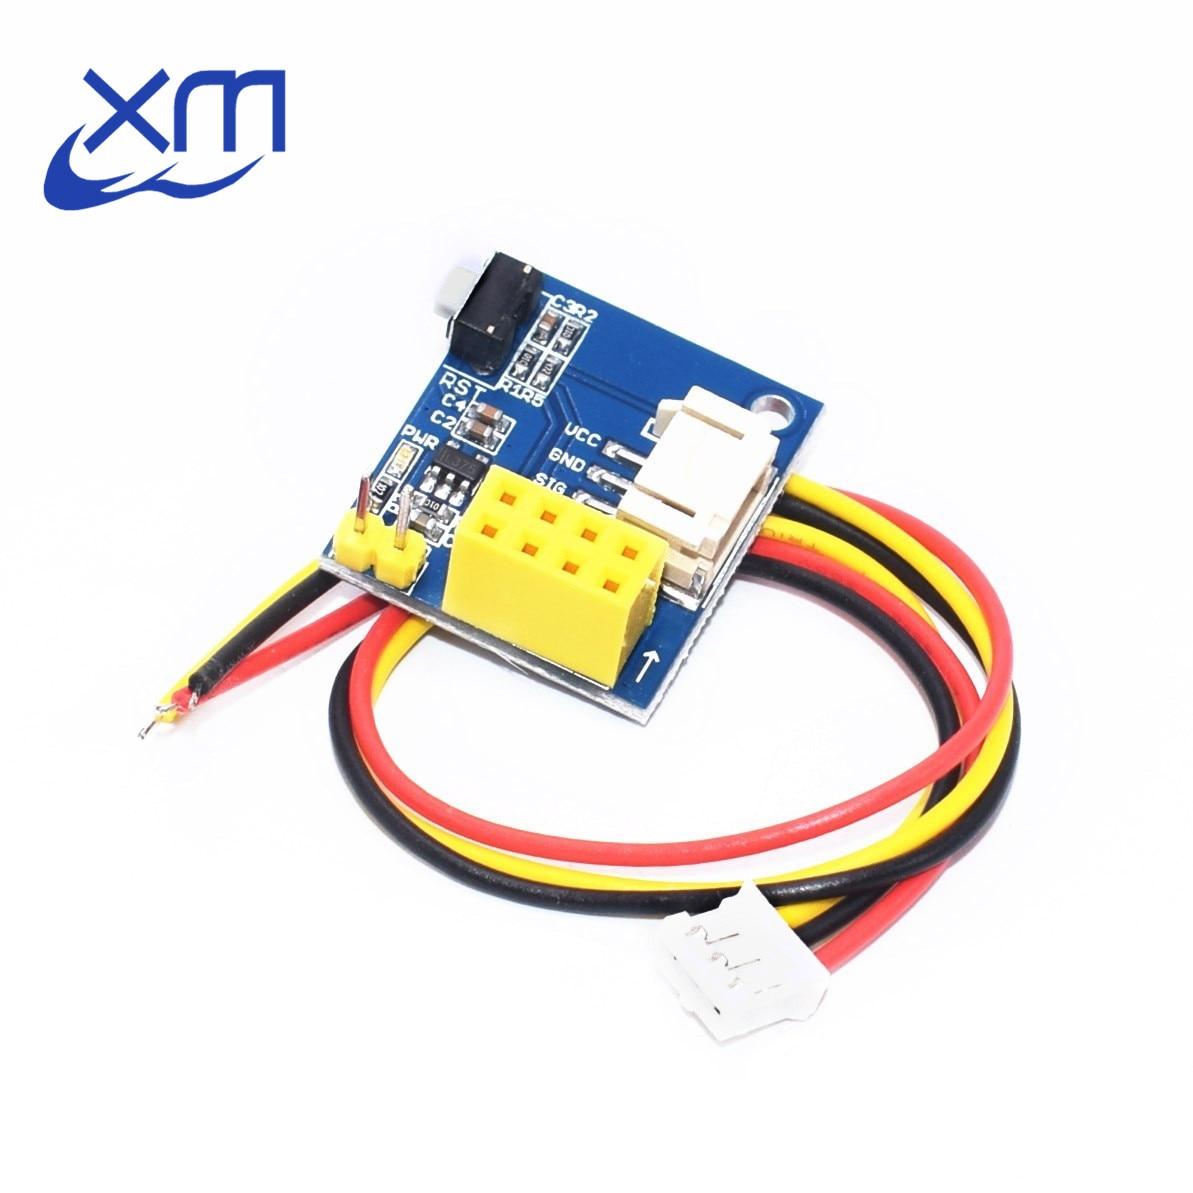 100pcs IDE 2,54 mm Laptop HDD PCB Mini Micro Jumper Bridge-Stecker langlebig